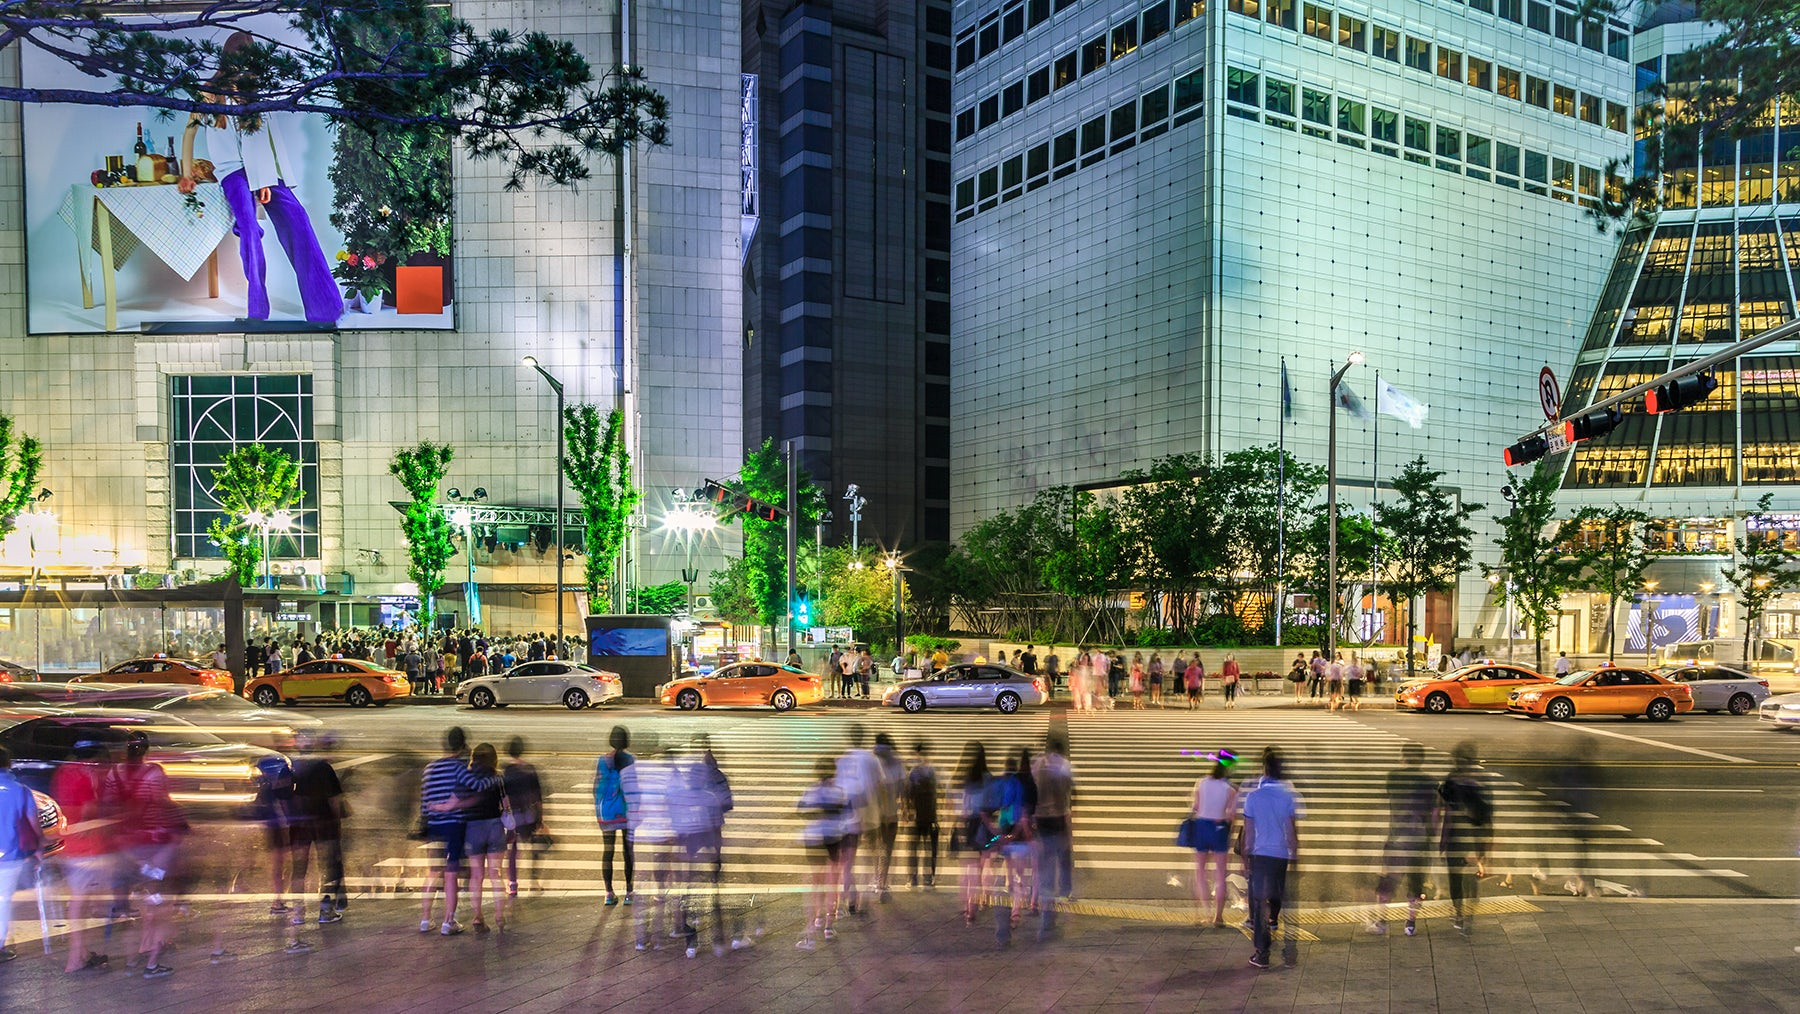 Seoul, South Korea | Source: Shutterstock